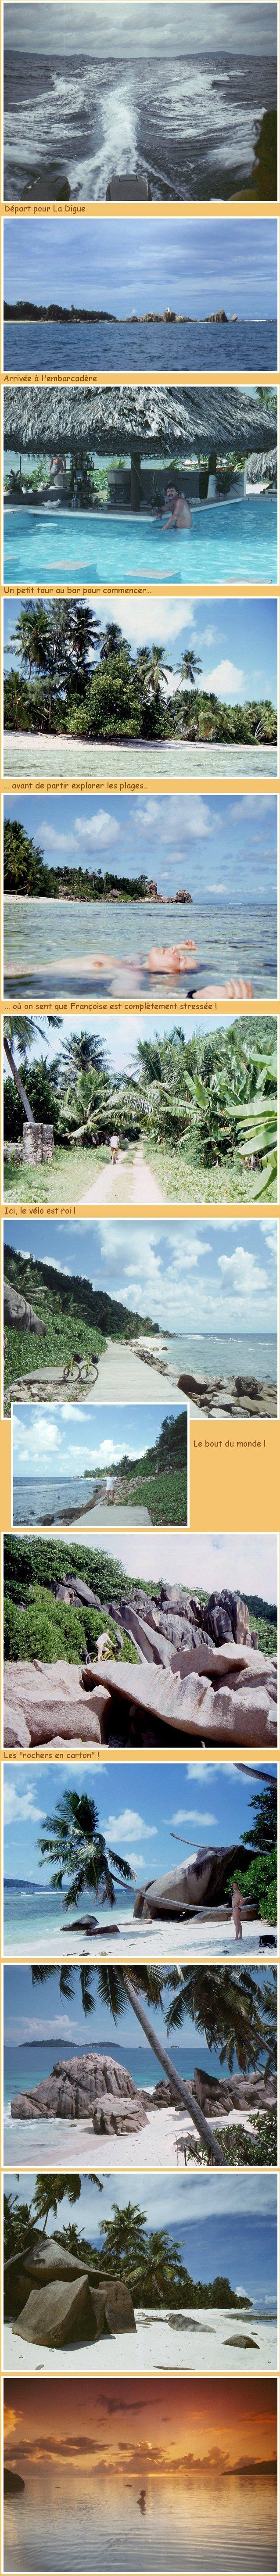 Les Seychelles - 8